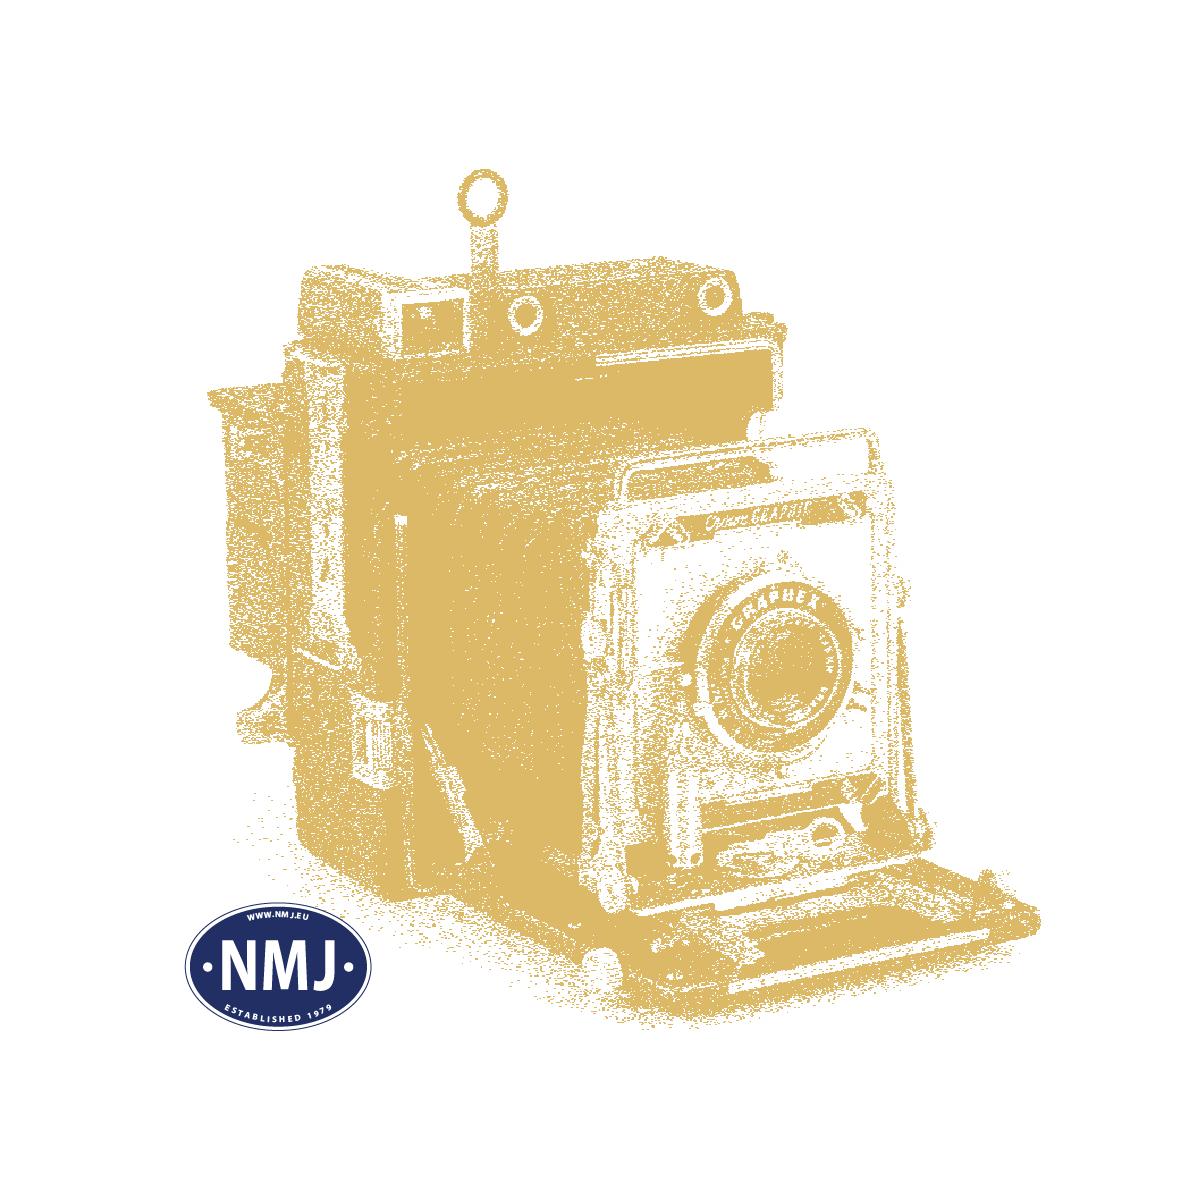 NMJT9906 - NMJ Topline Parts for RPS